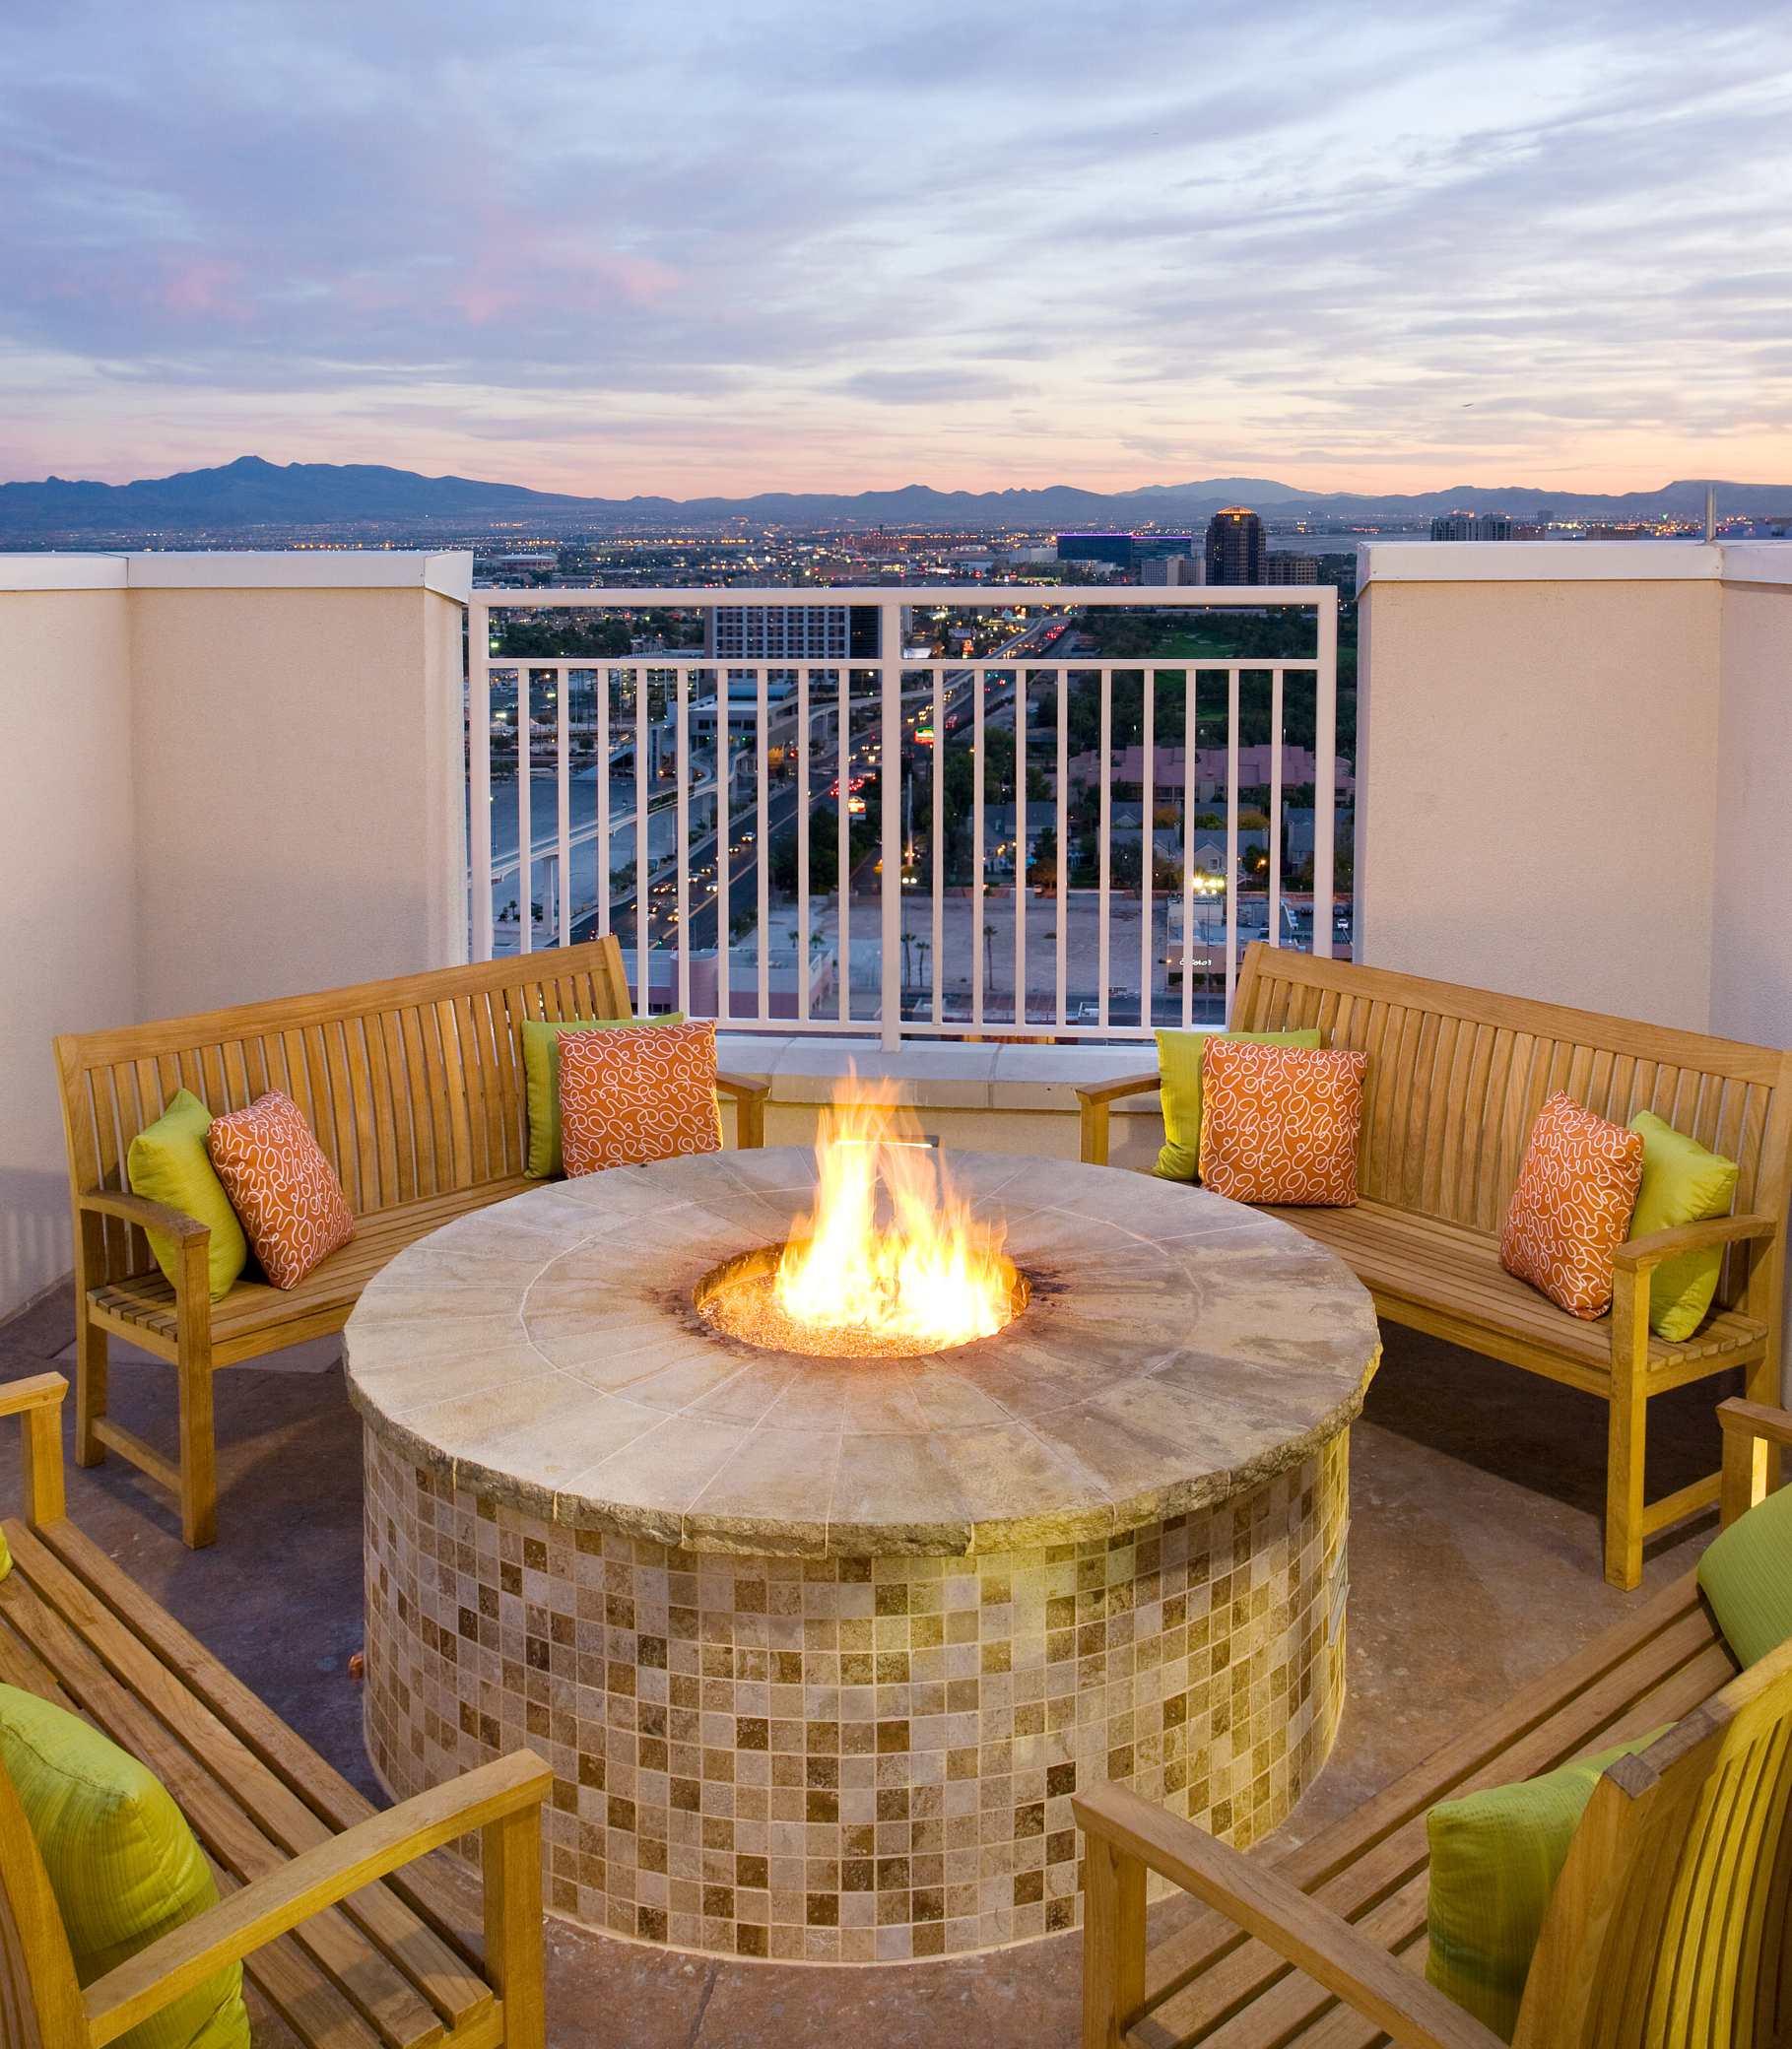 SpringHill Suites by Marriott Las Vegas Convention Center image 11